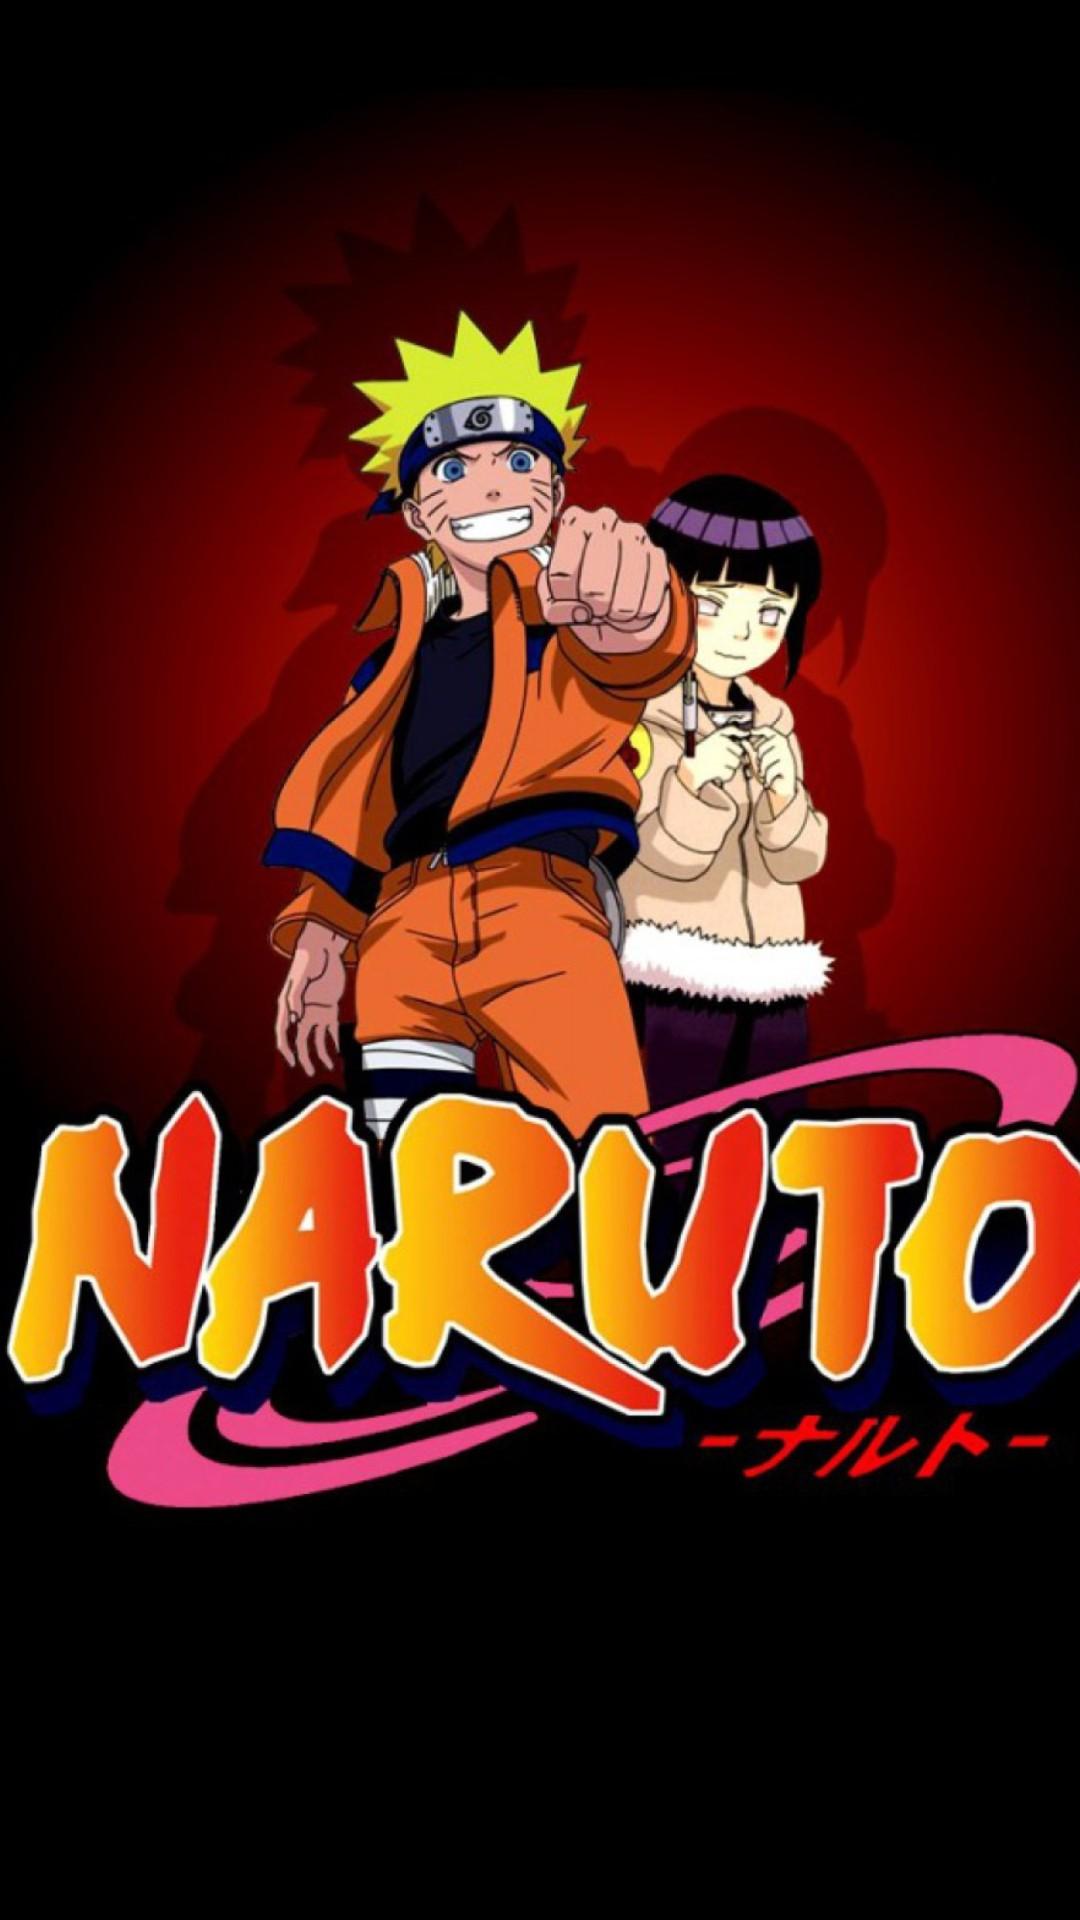 best naruto wallpapers, naruto wallpaper 4k